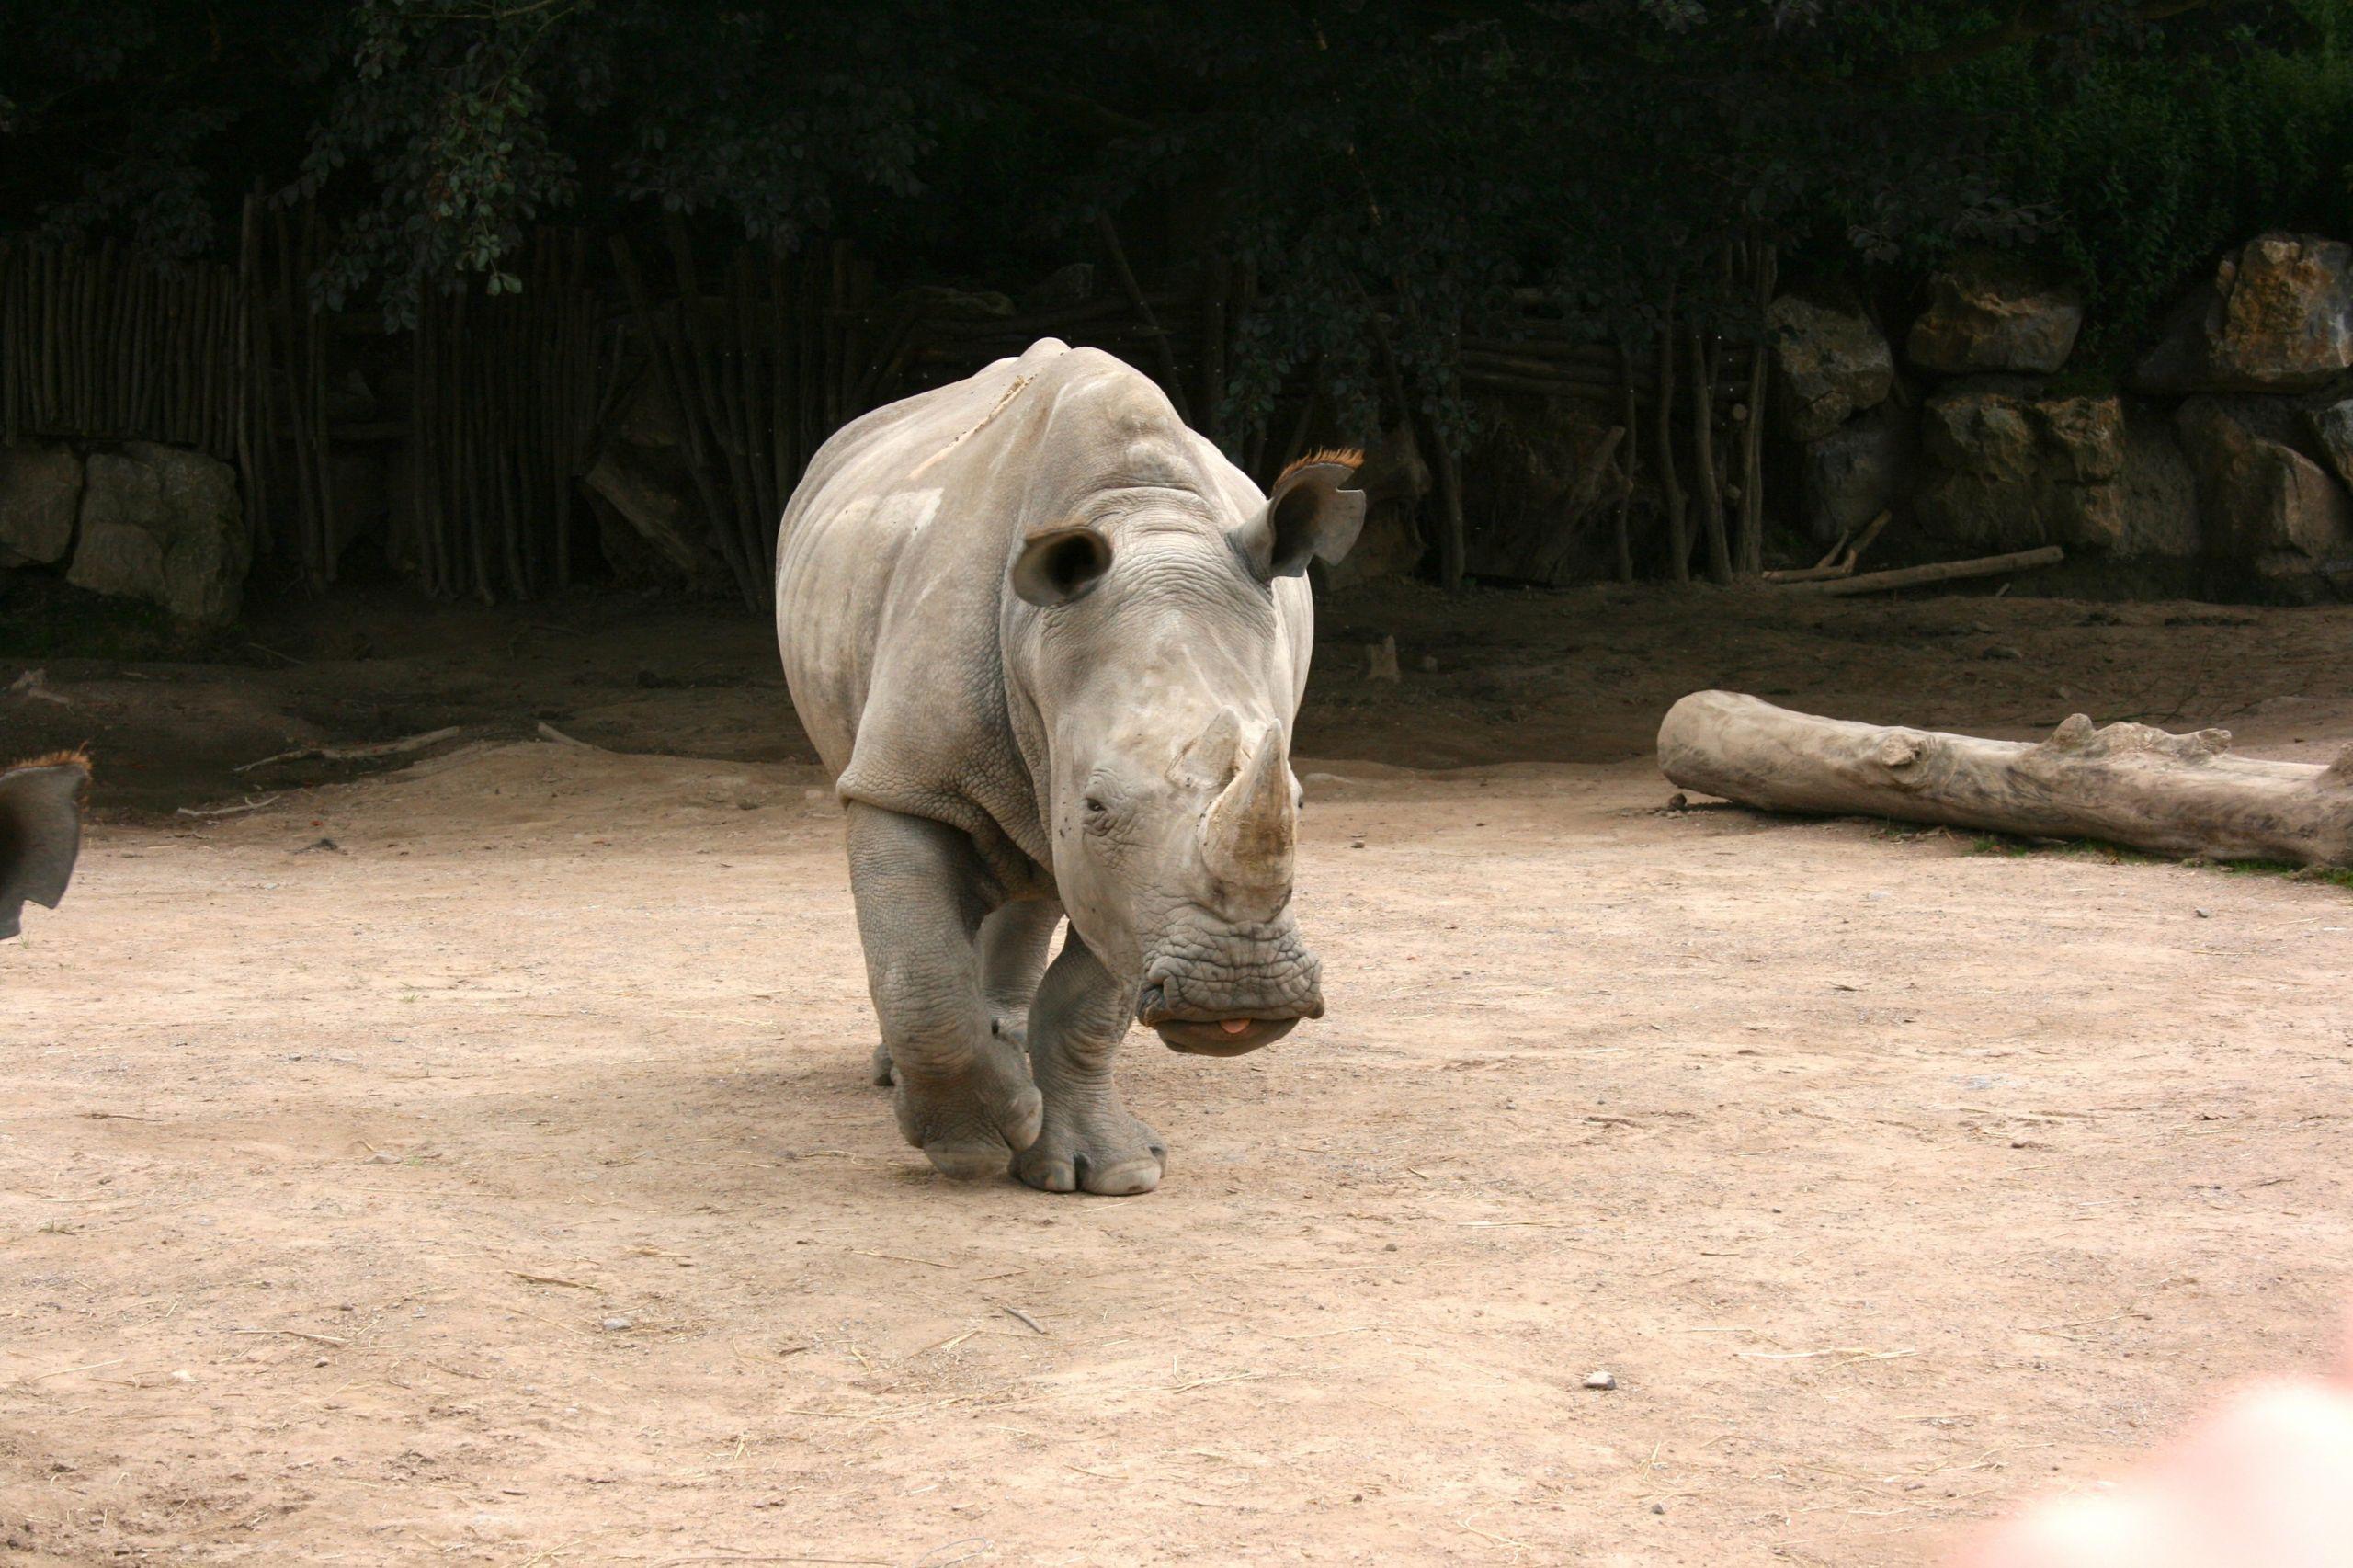 Wallpapers Animals Rhinoceros Rhinocéros